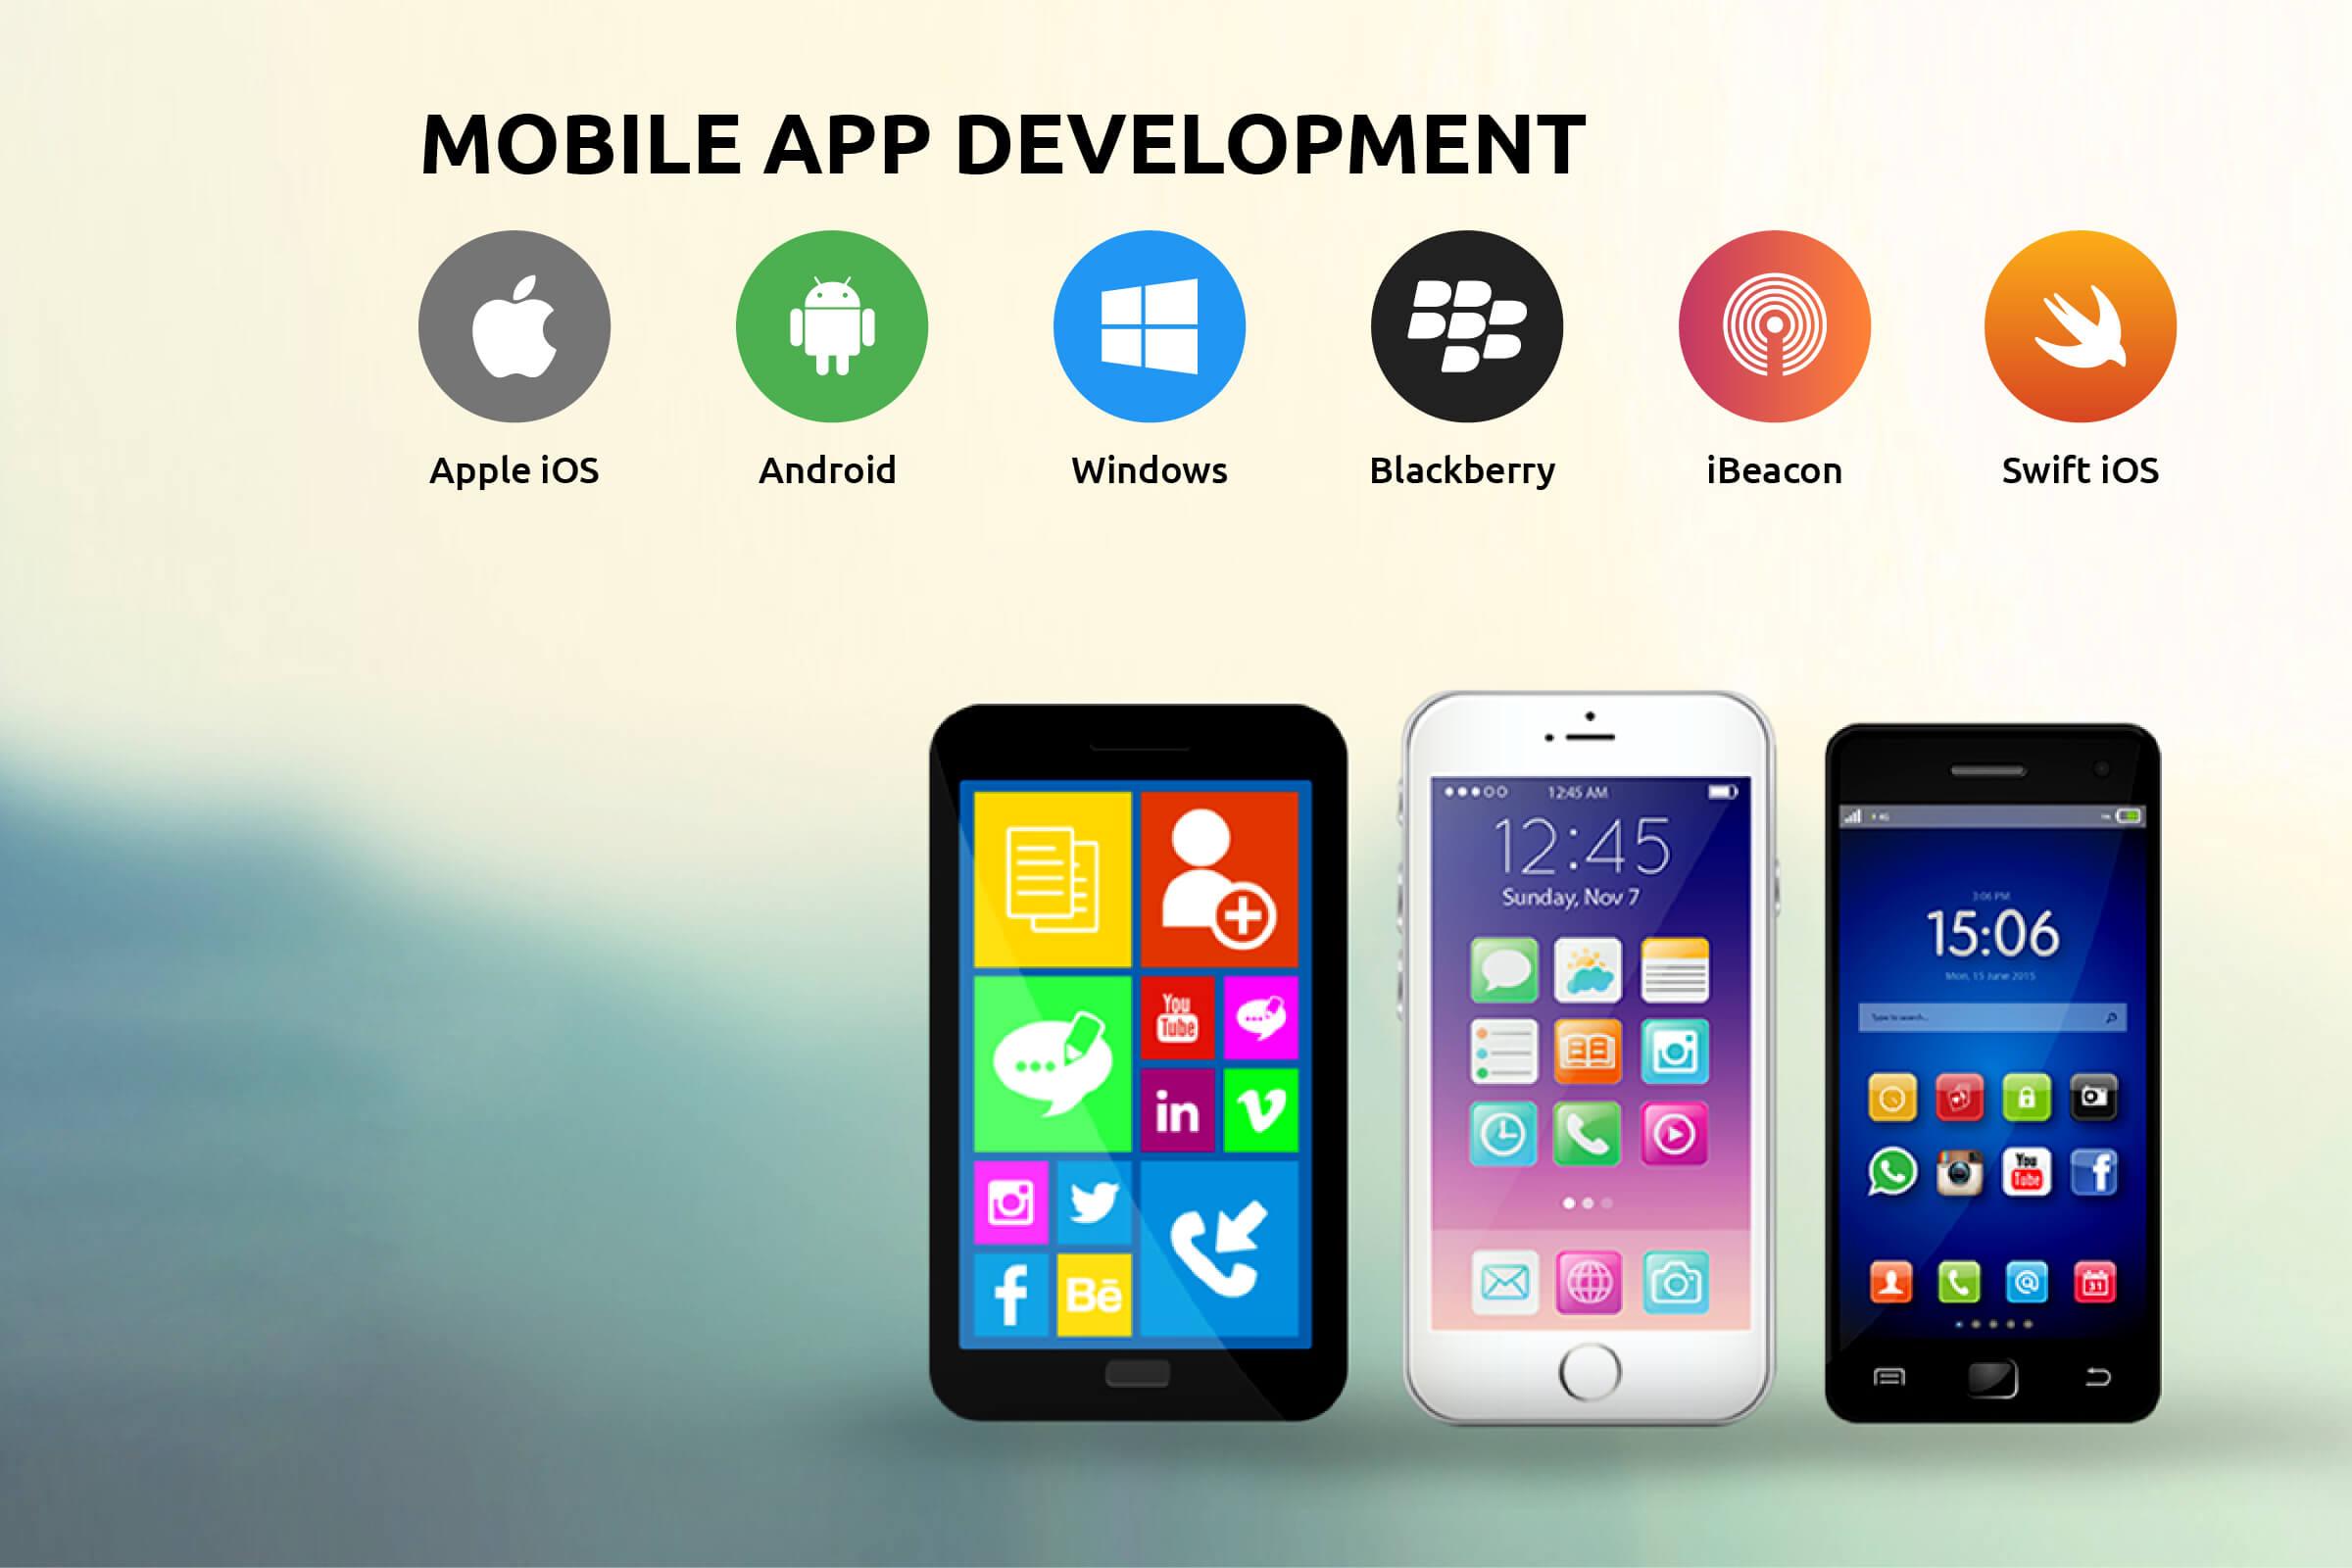 Top trends in the field of Mobile App Development